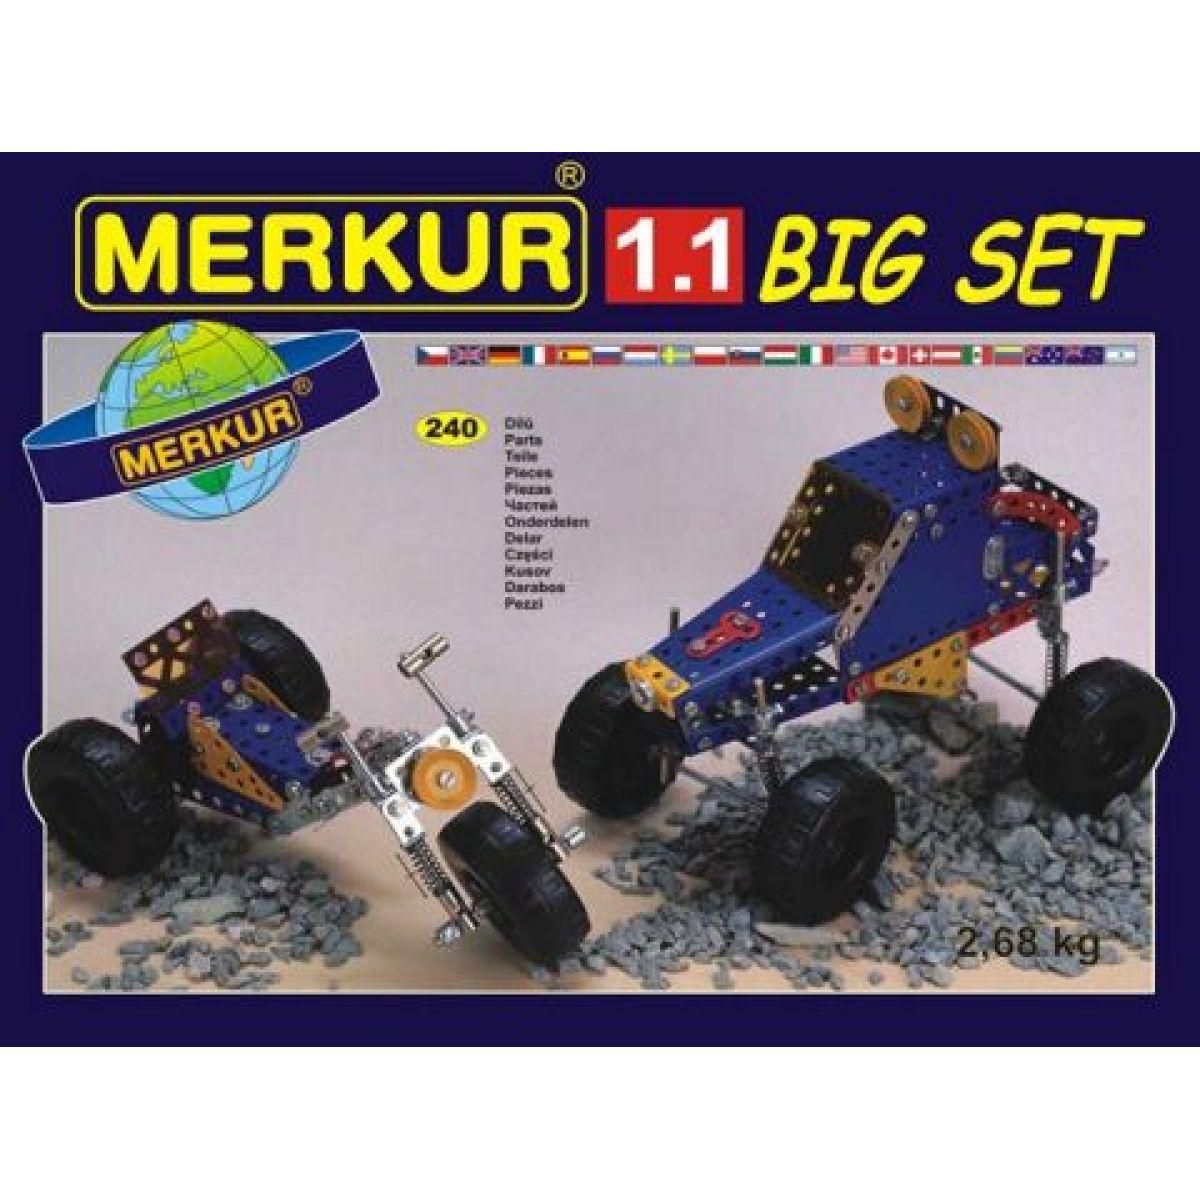 Merkur M 1.1